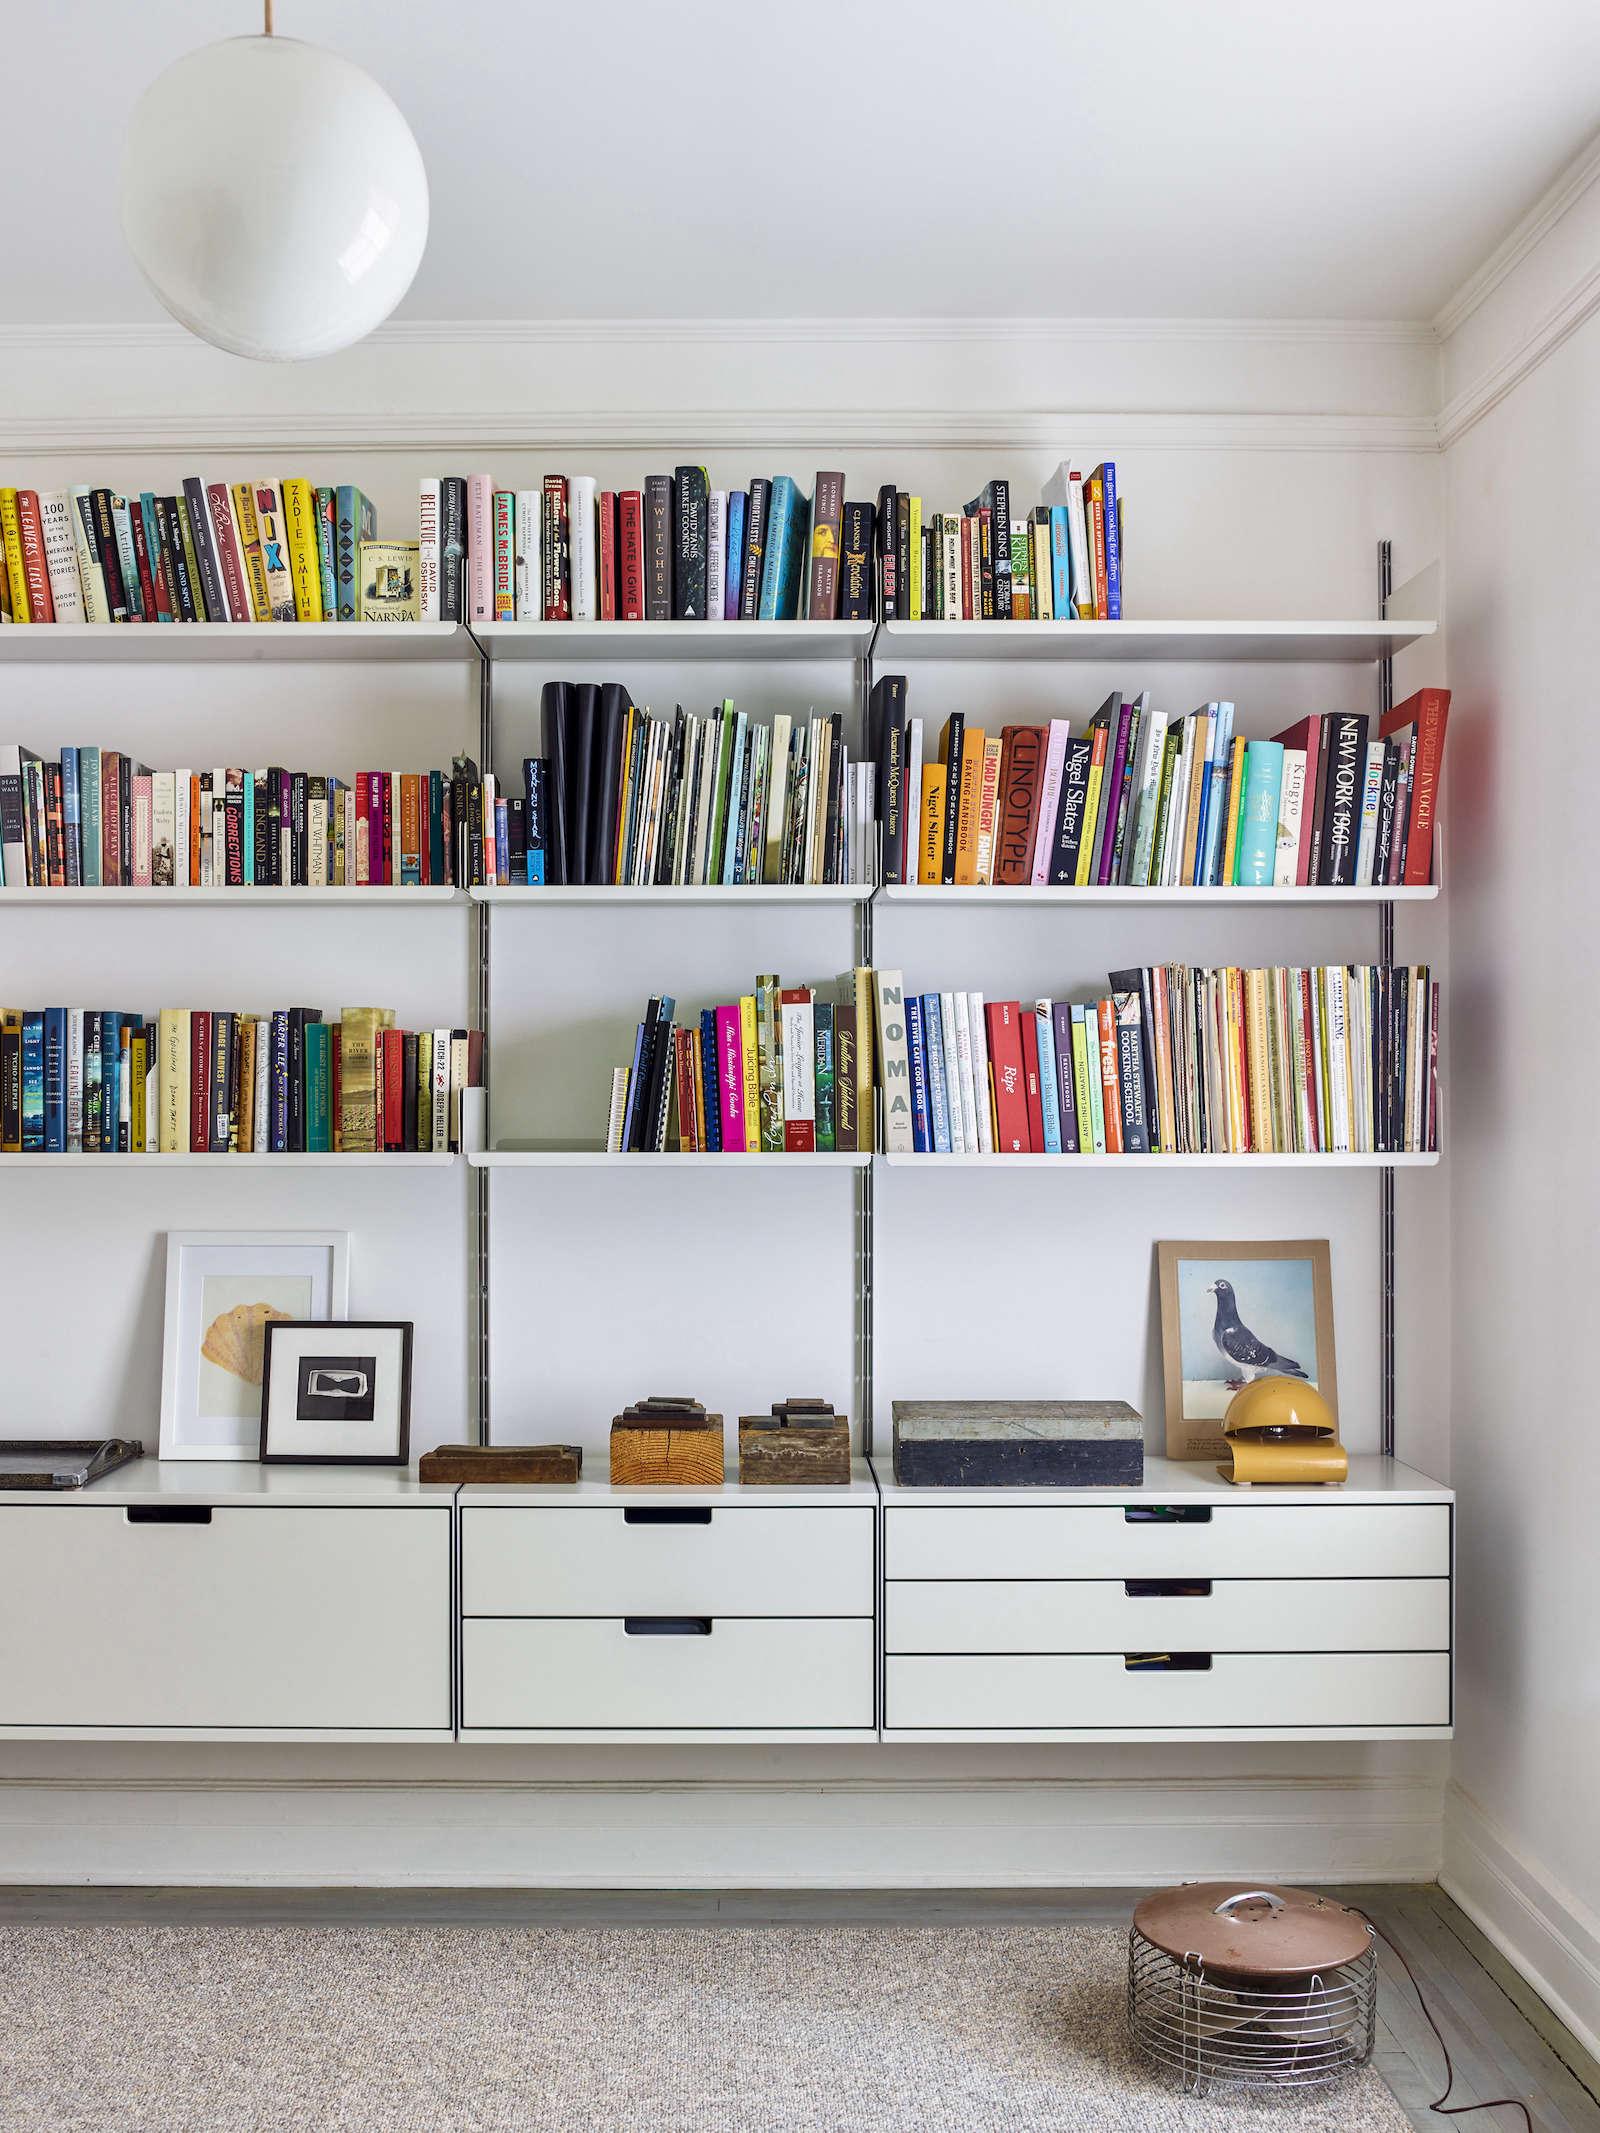 Matthew Axe Jackson Heights Apartment Vitsoe Shelves by Eric Piasecki